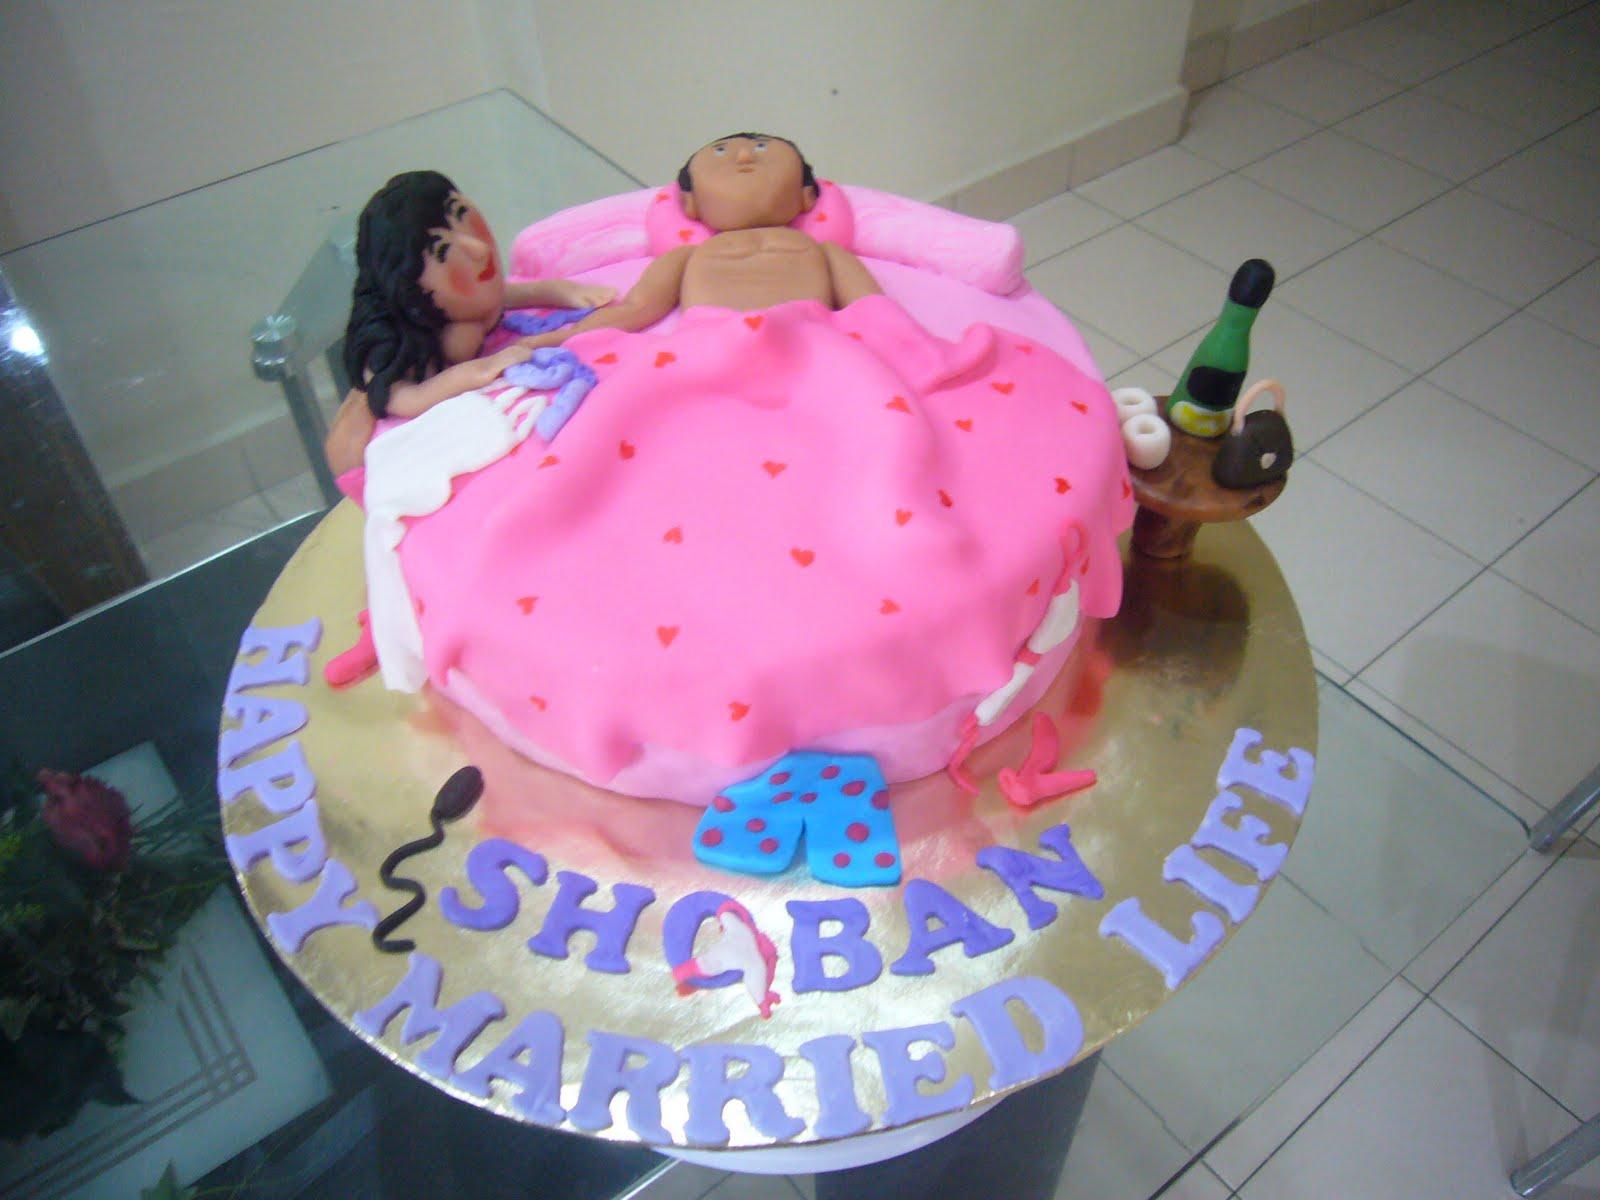 SIMPLY DELICIOUS CAKES NAUGHTY CAKE  SEDUCTION